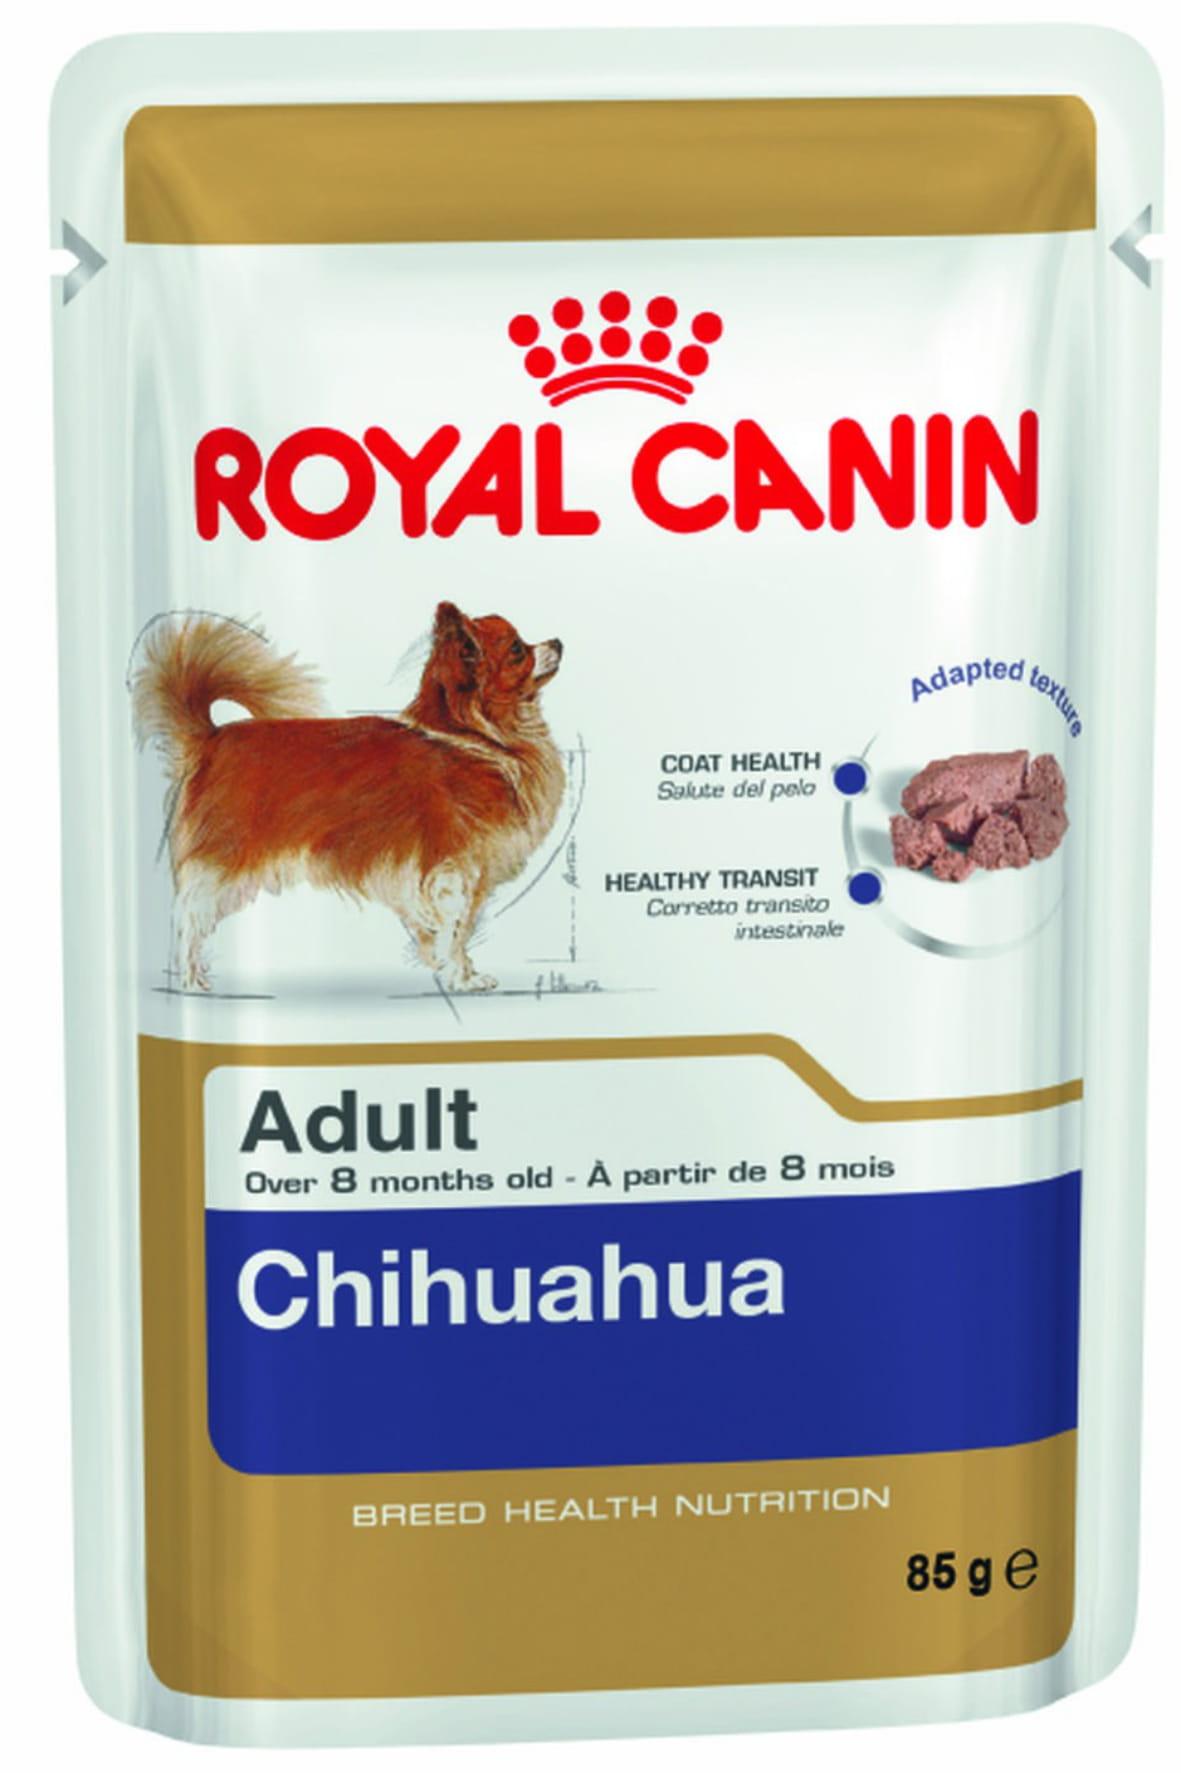 Корм Royal Canin для собак и щенков  купить сухой корм